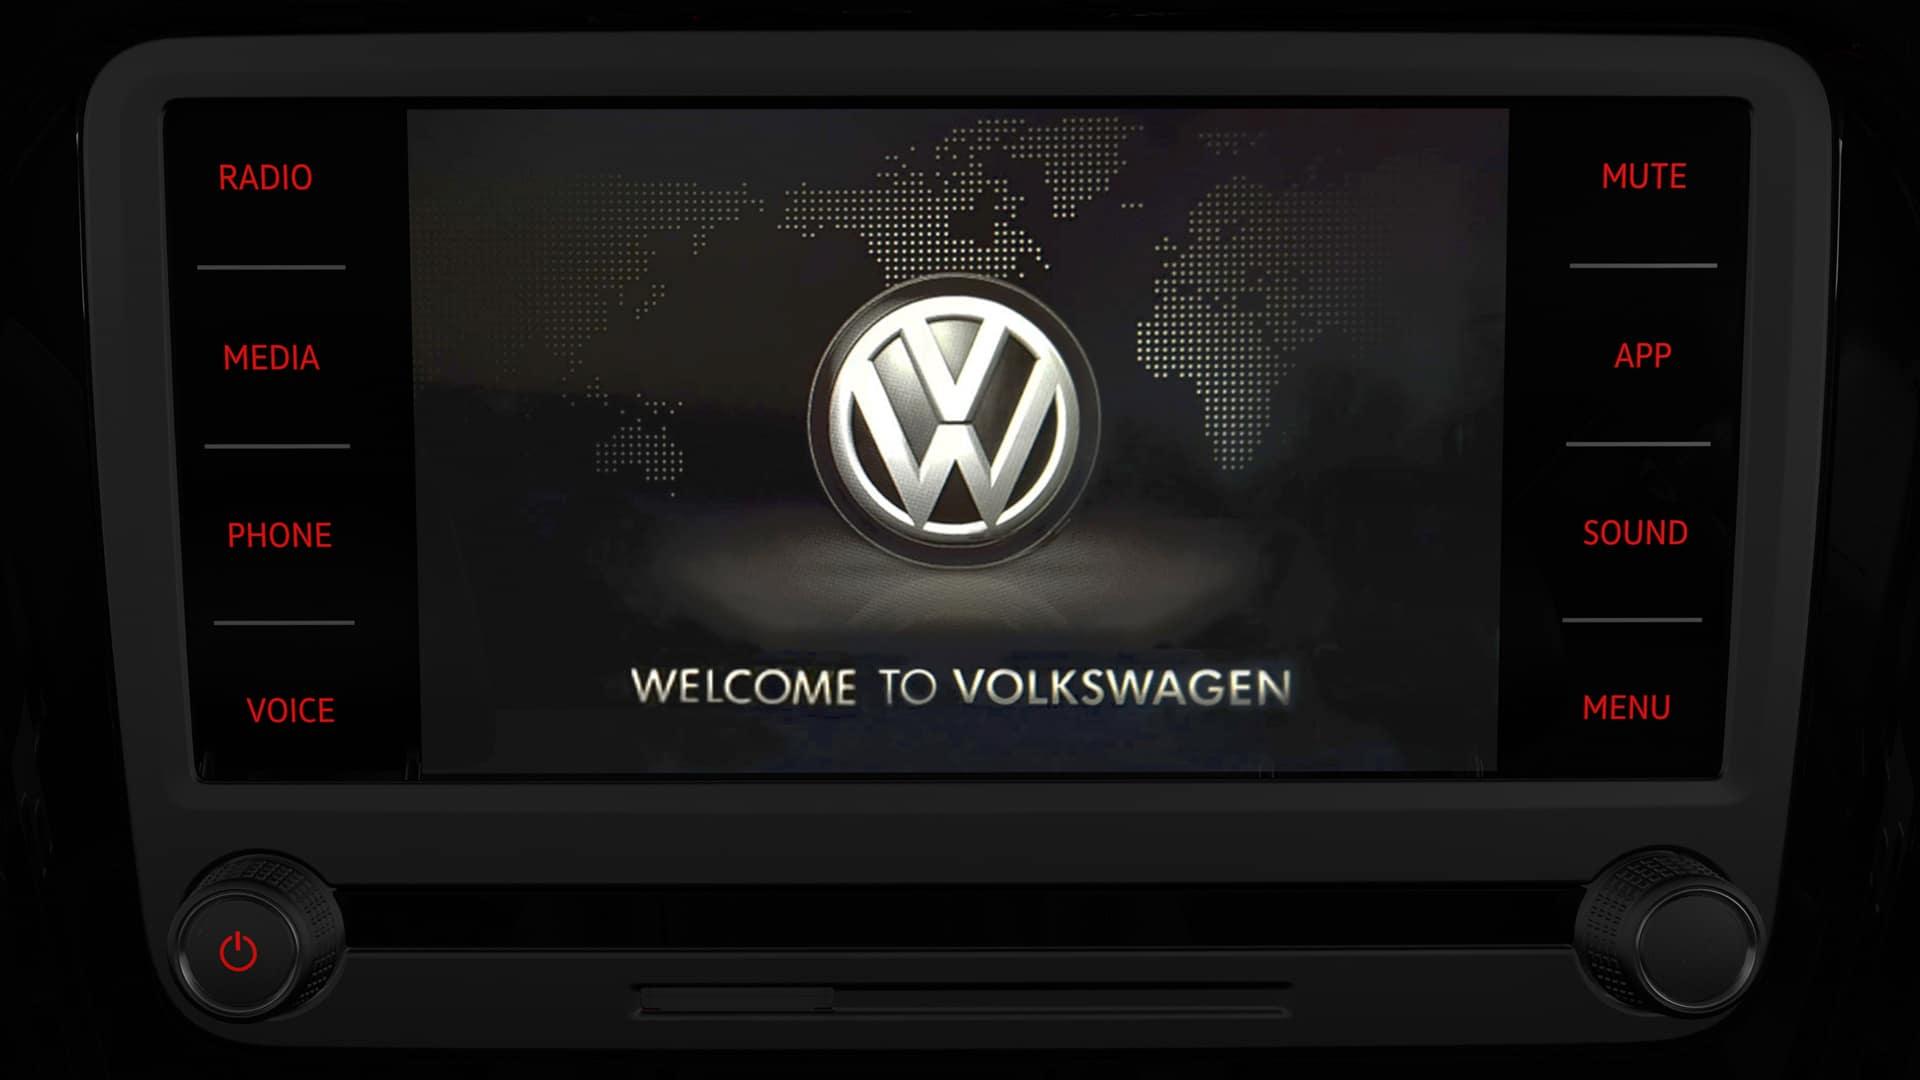 VW touchscreen welcome screen